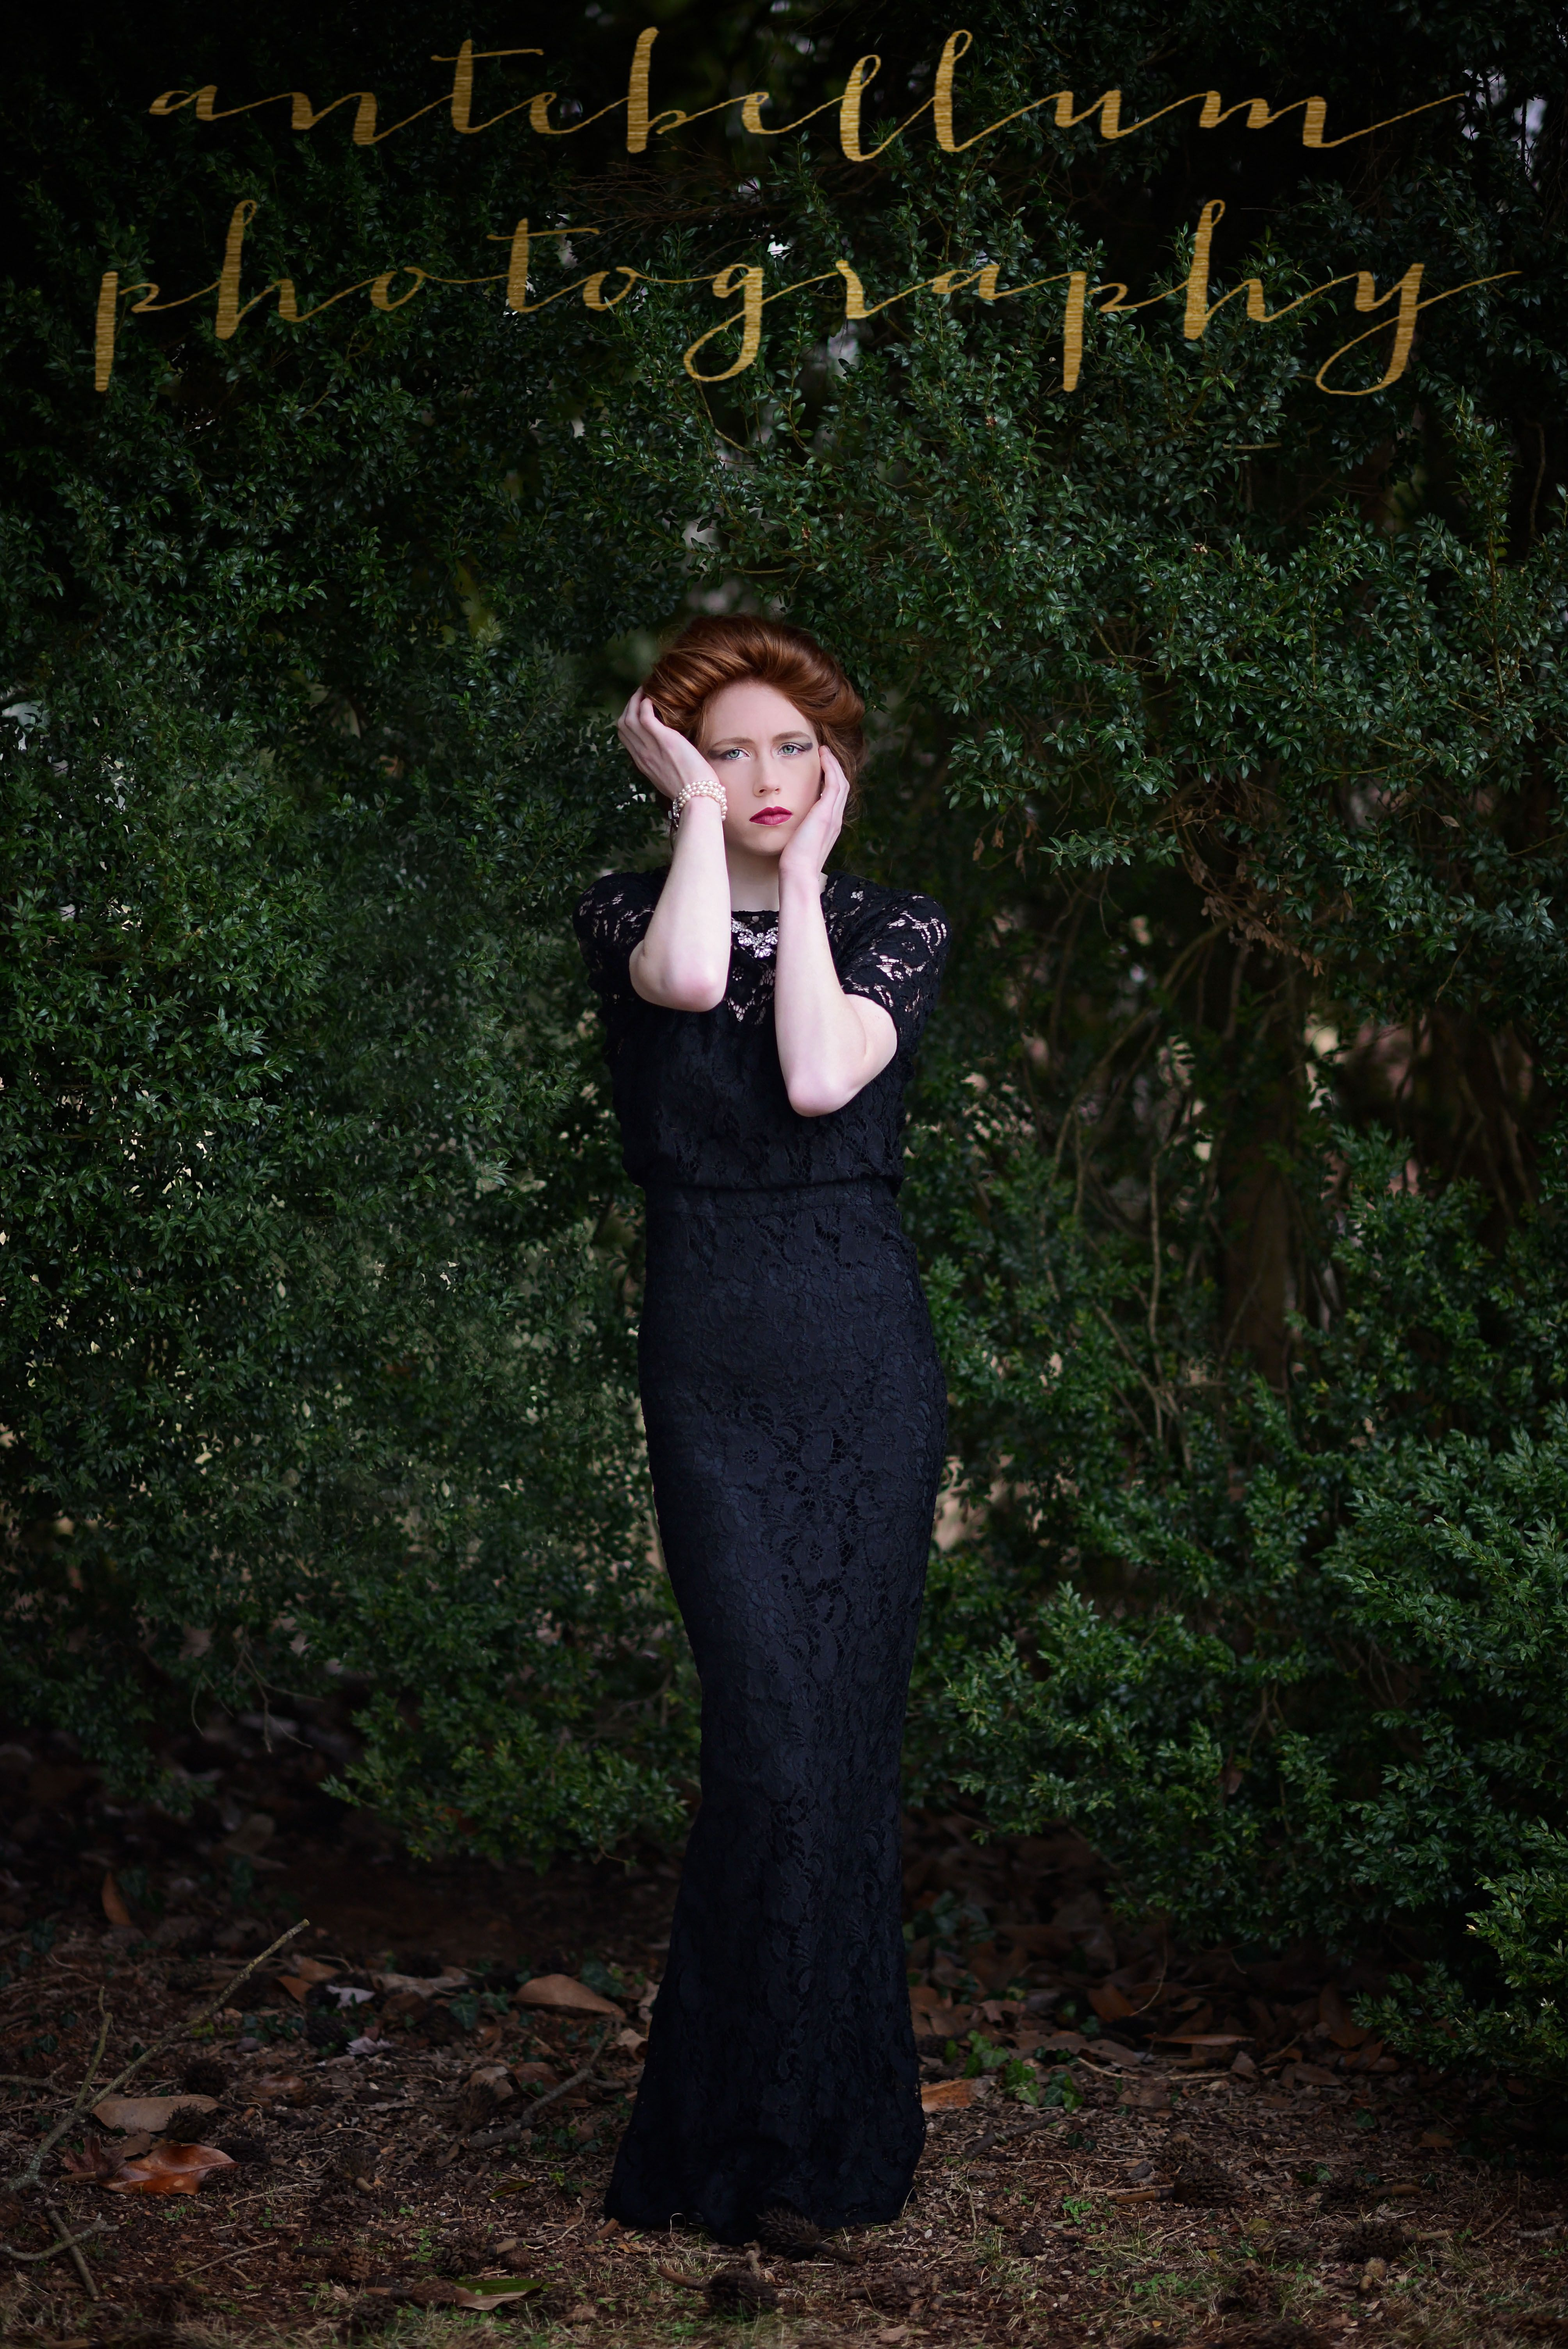 Editorial photography | Edwardian style | Fashion photography | Gibson girl | Nashville, TN | Photography | Moschino | Ben Amun